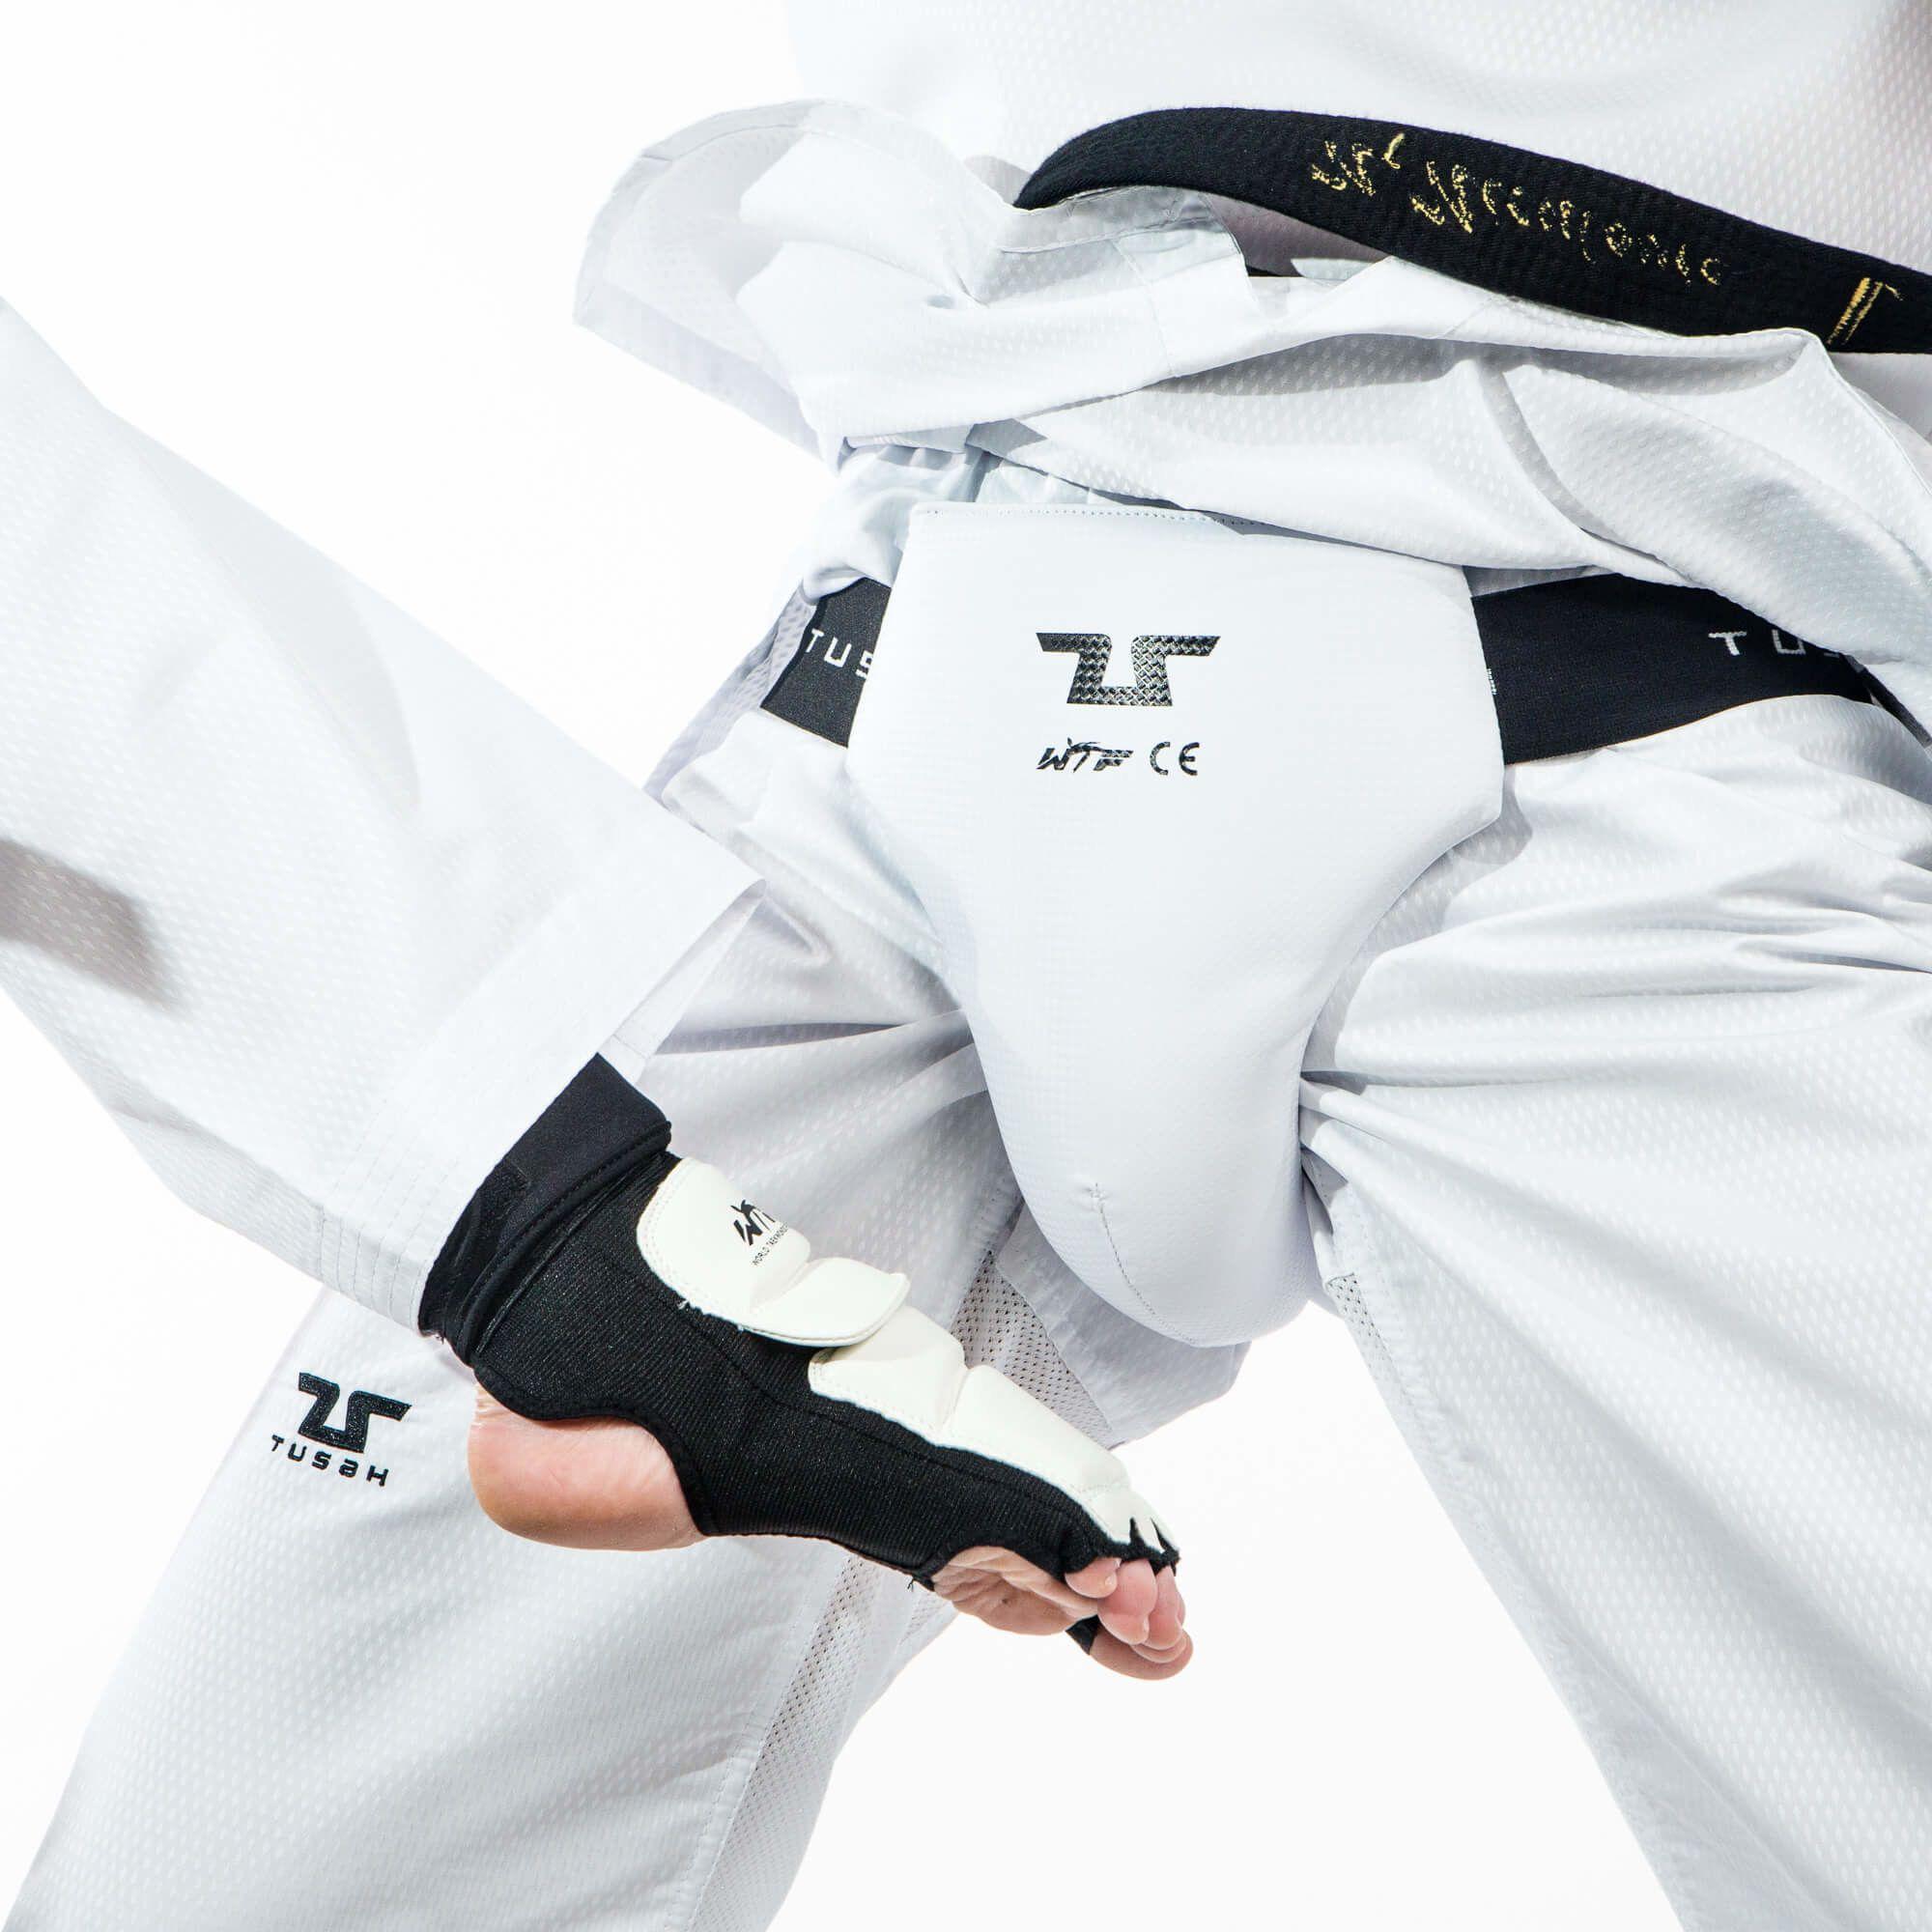 Conchiglia Maschile Tusah per Taekwondo Omologata WT protezione inguine